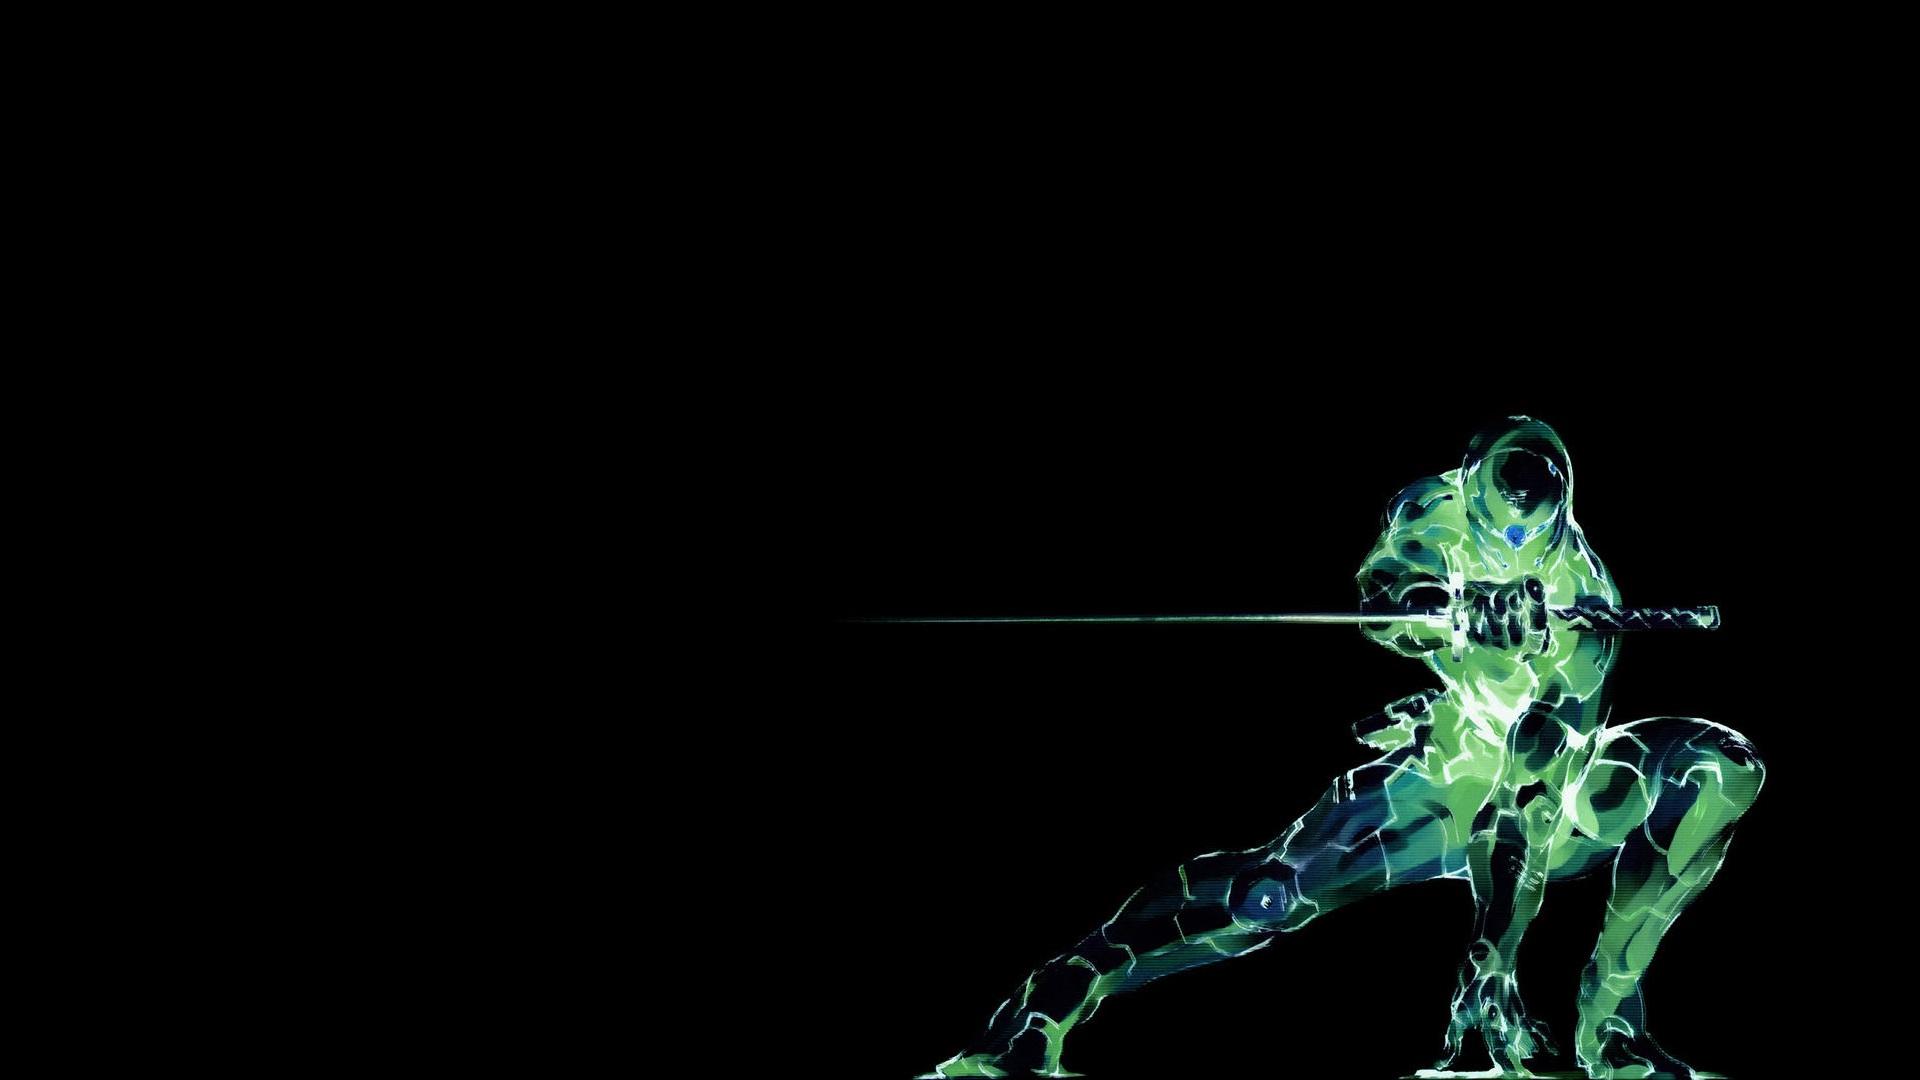 Metal Gear Solid HD Wallpaper Background Image 1920x1080 ID 1920x1080